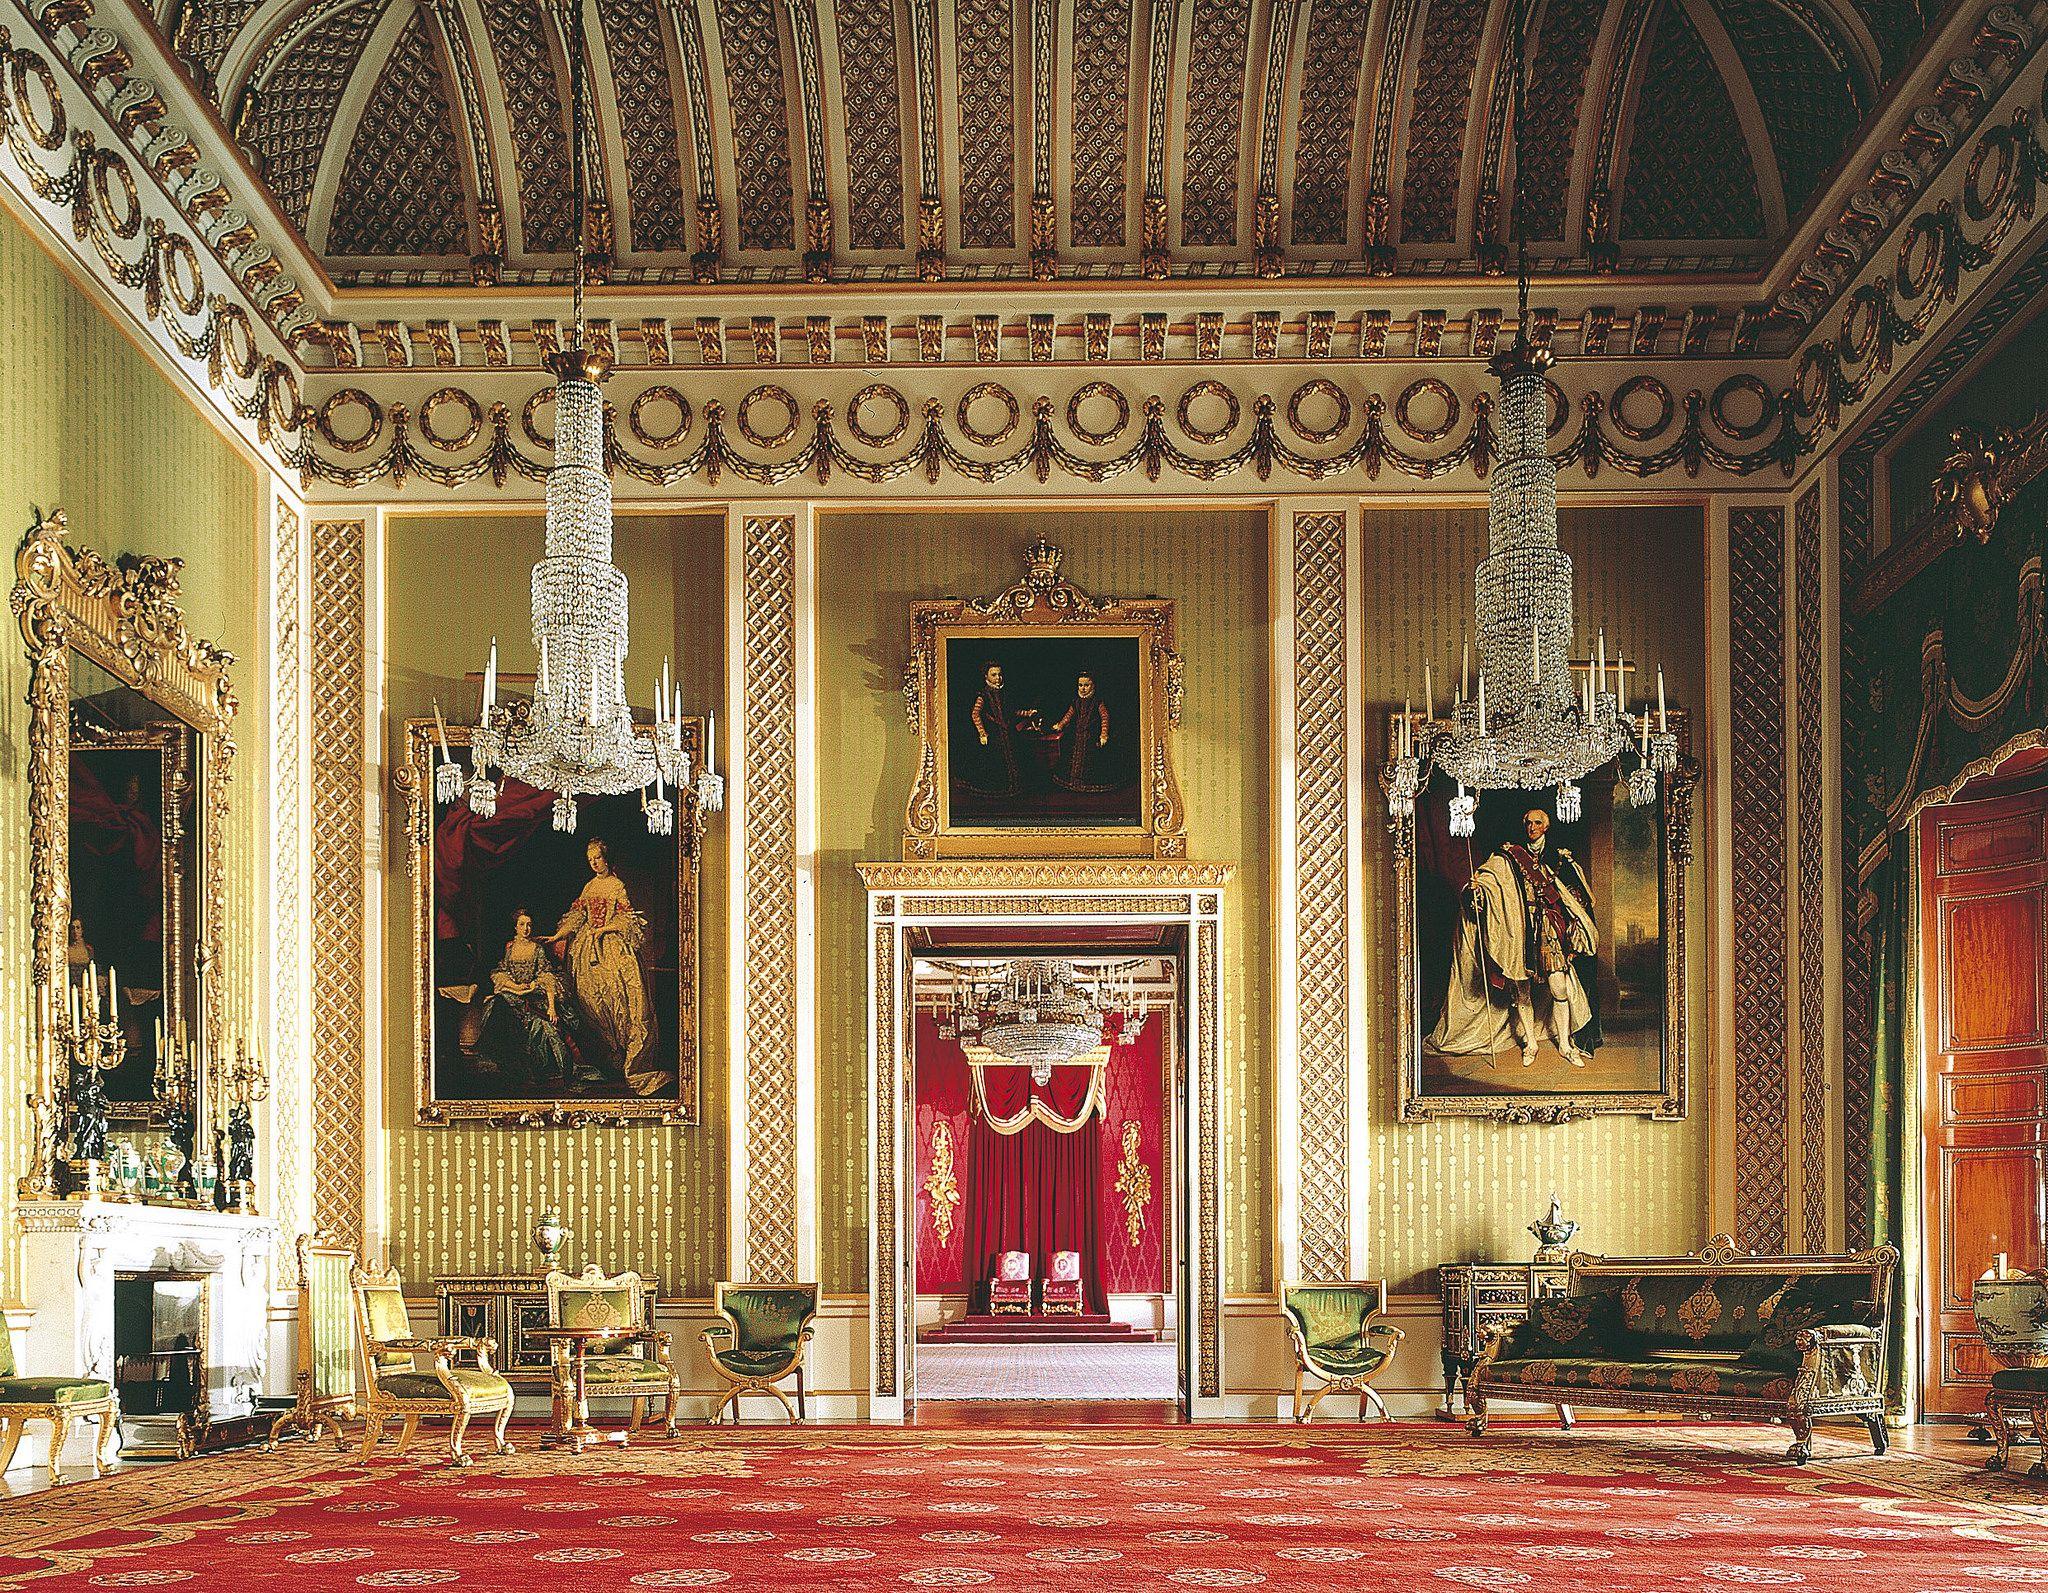 BP_GDR (Derry Moore) | Palace interior, Buckingham palace ...